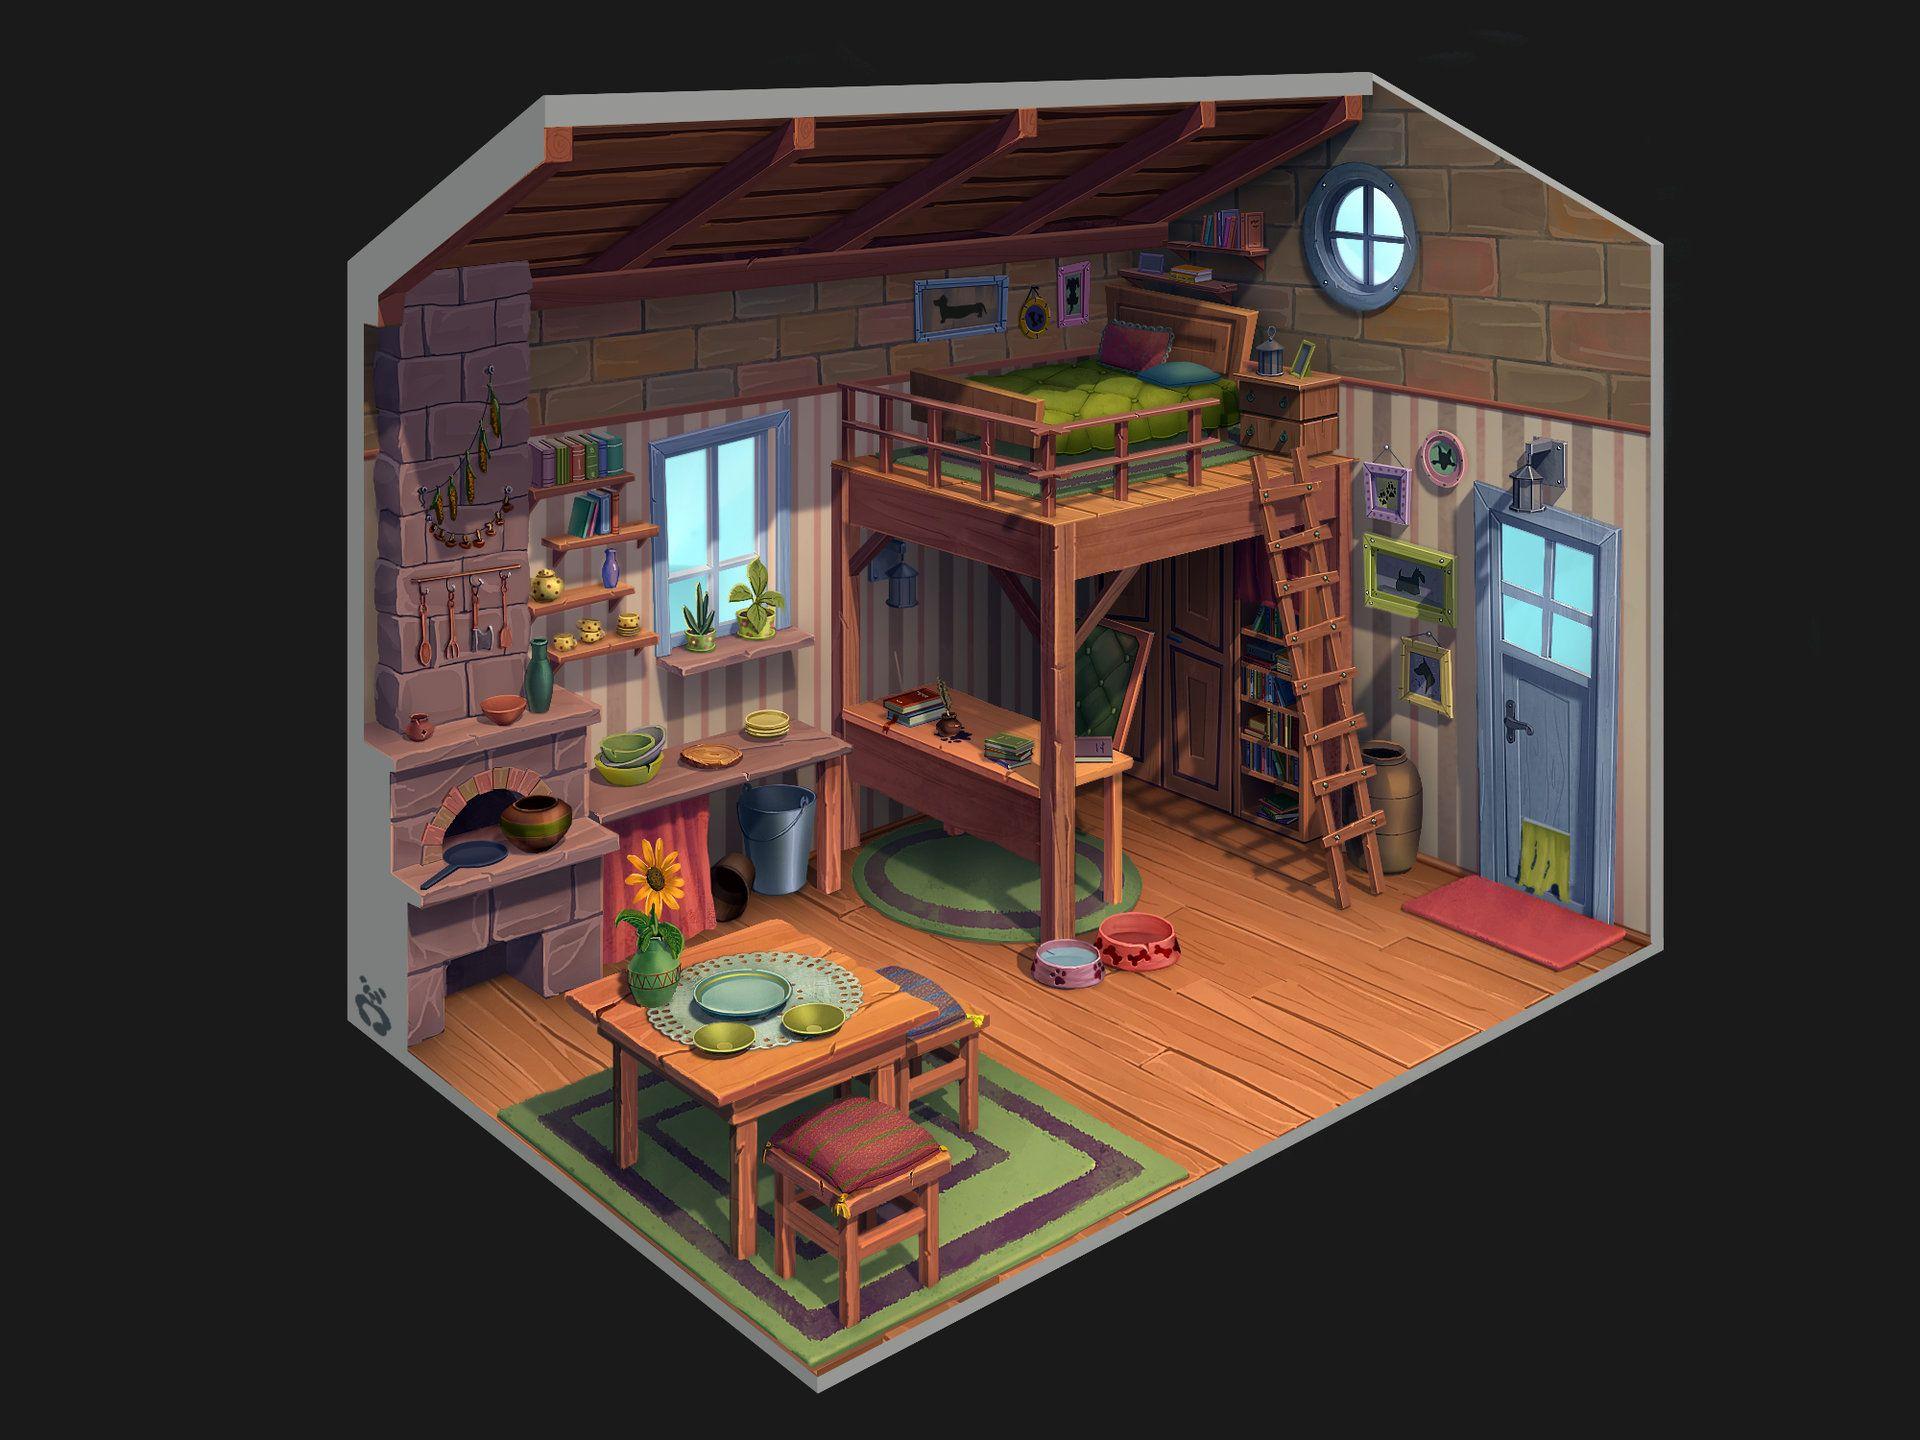 House_interior, Yana Blyzniuk Game art, Concept art